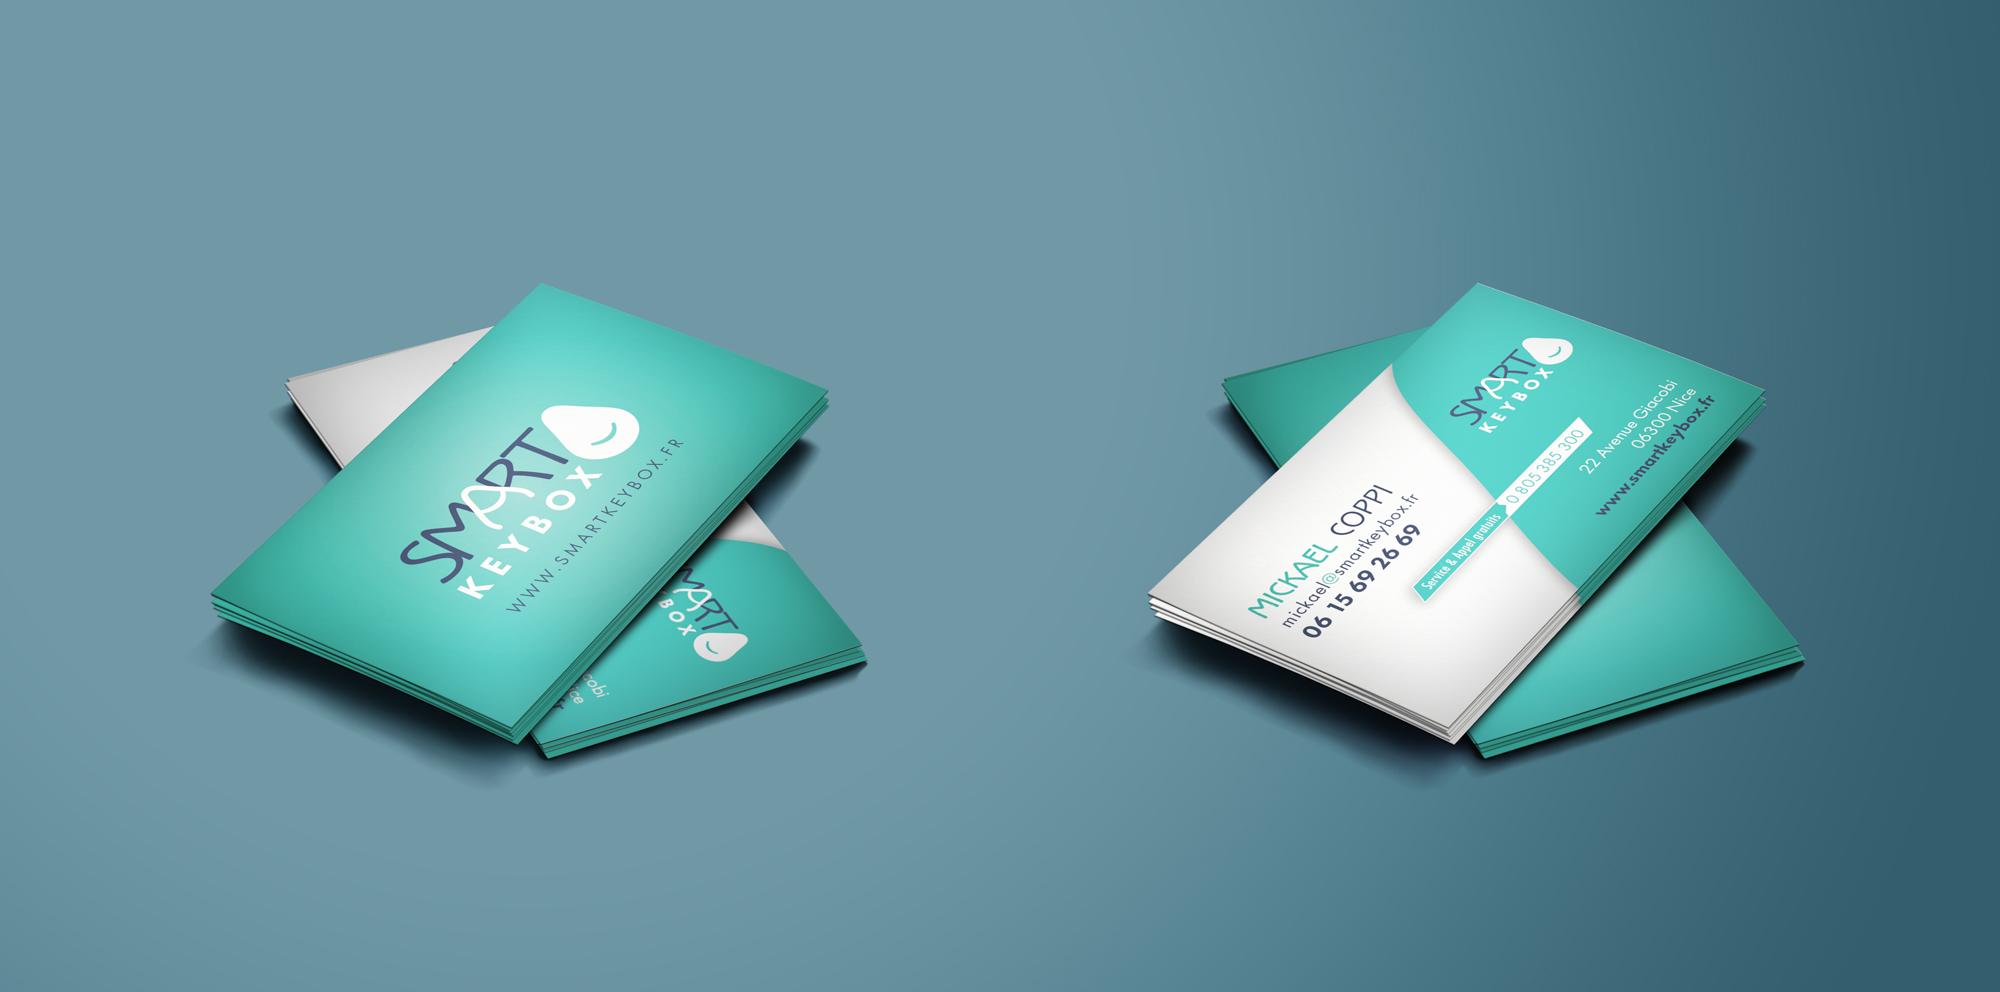 CDV-Smart-Keybox-Mockup